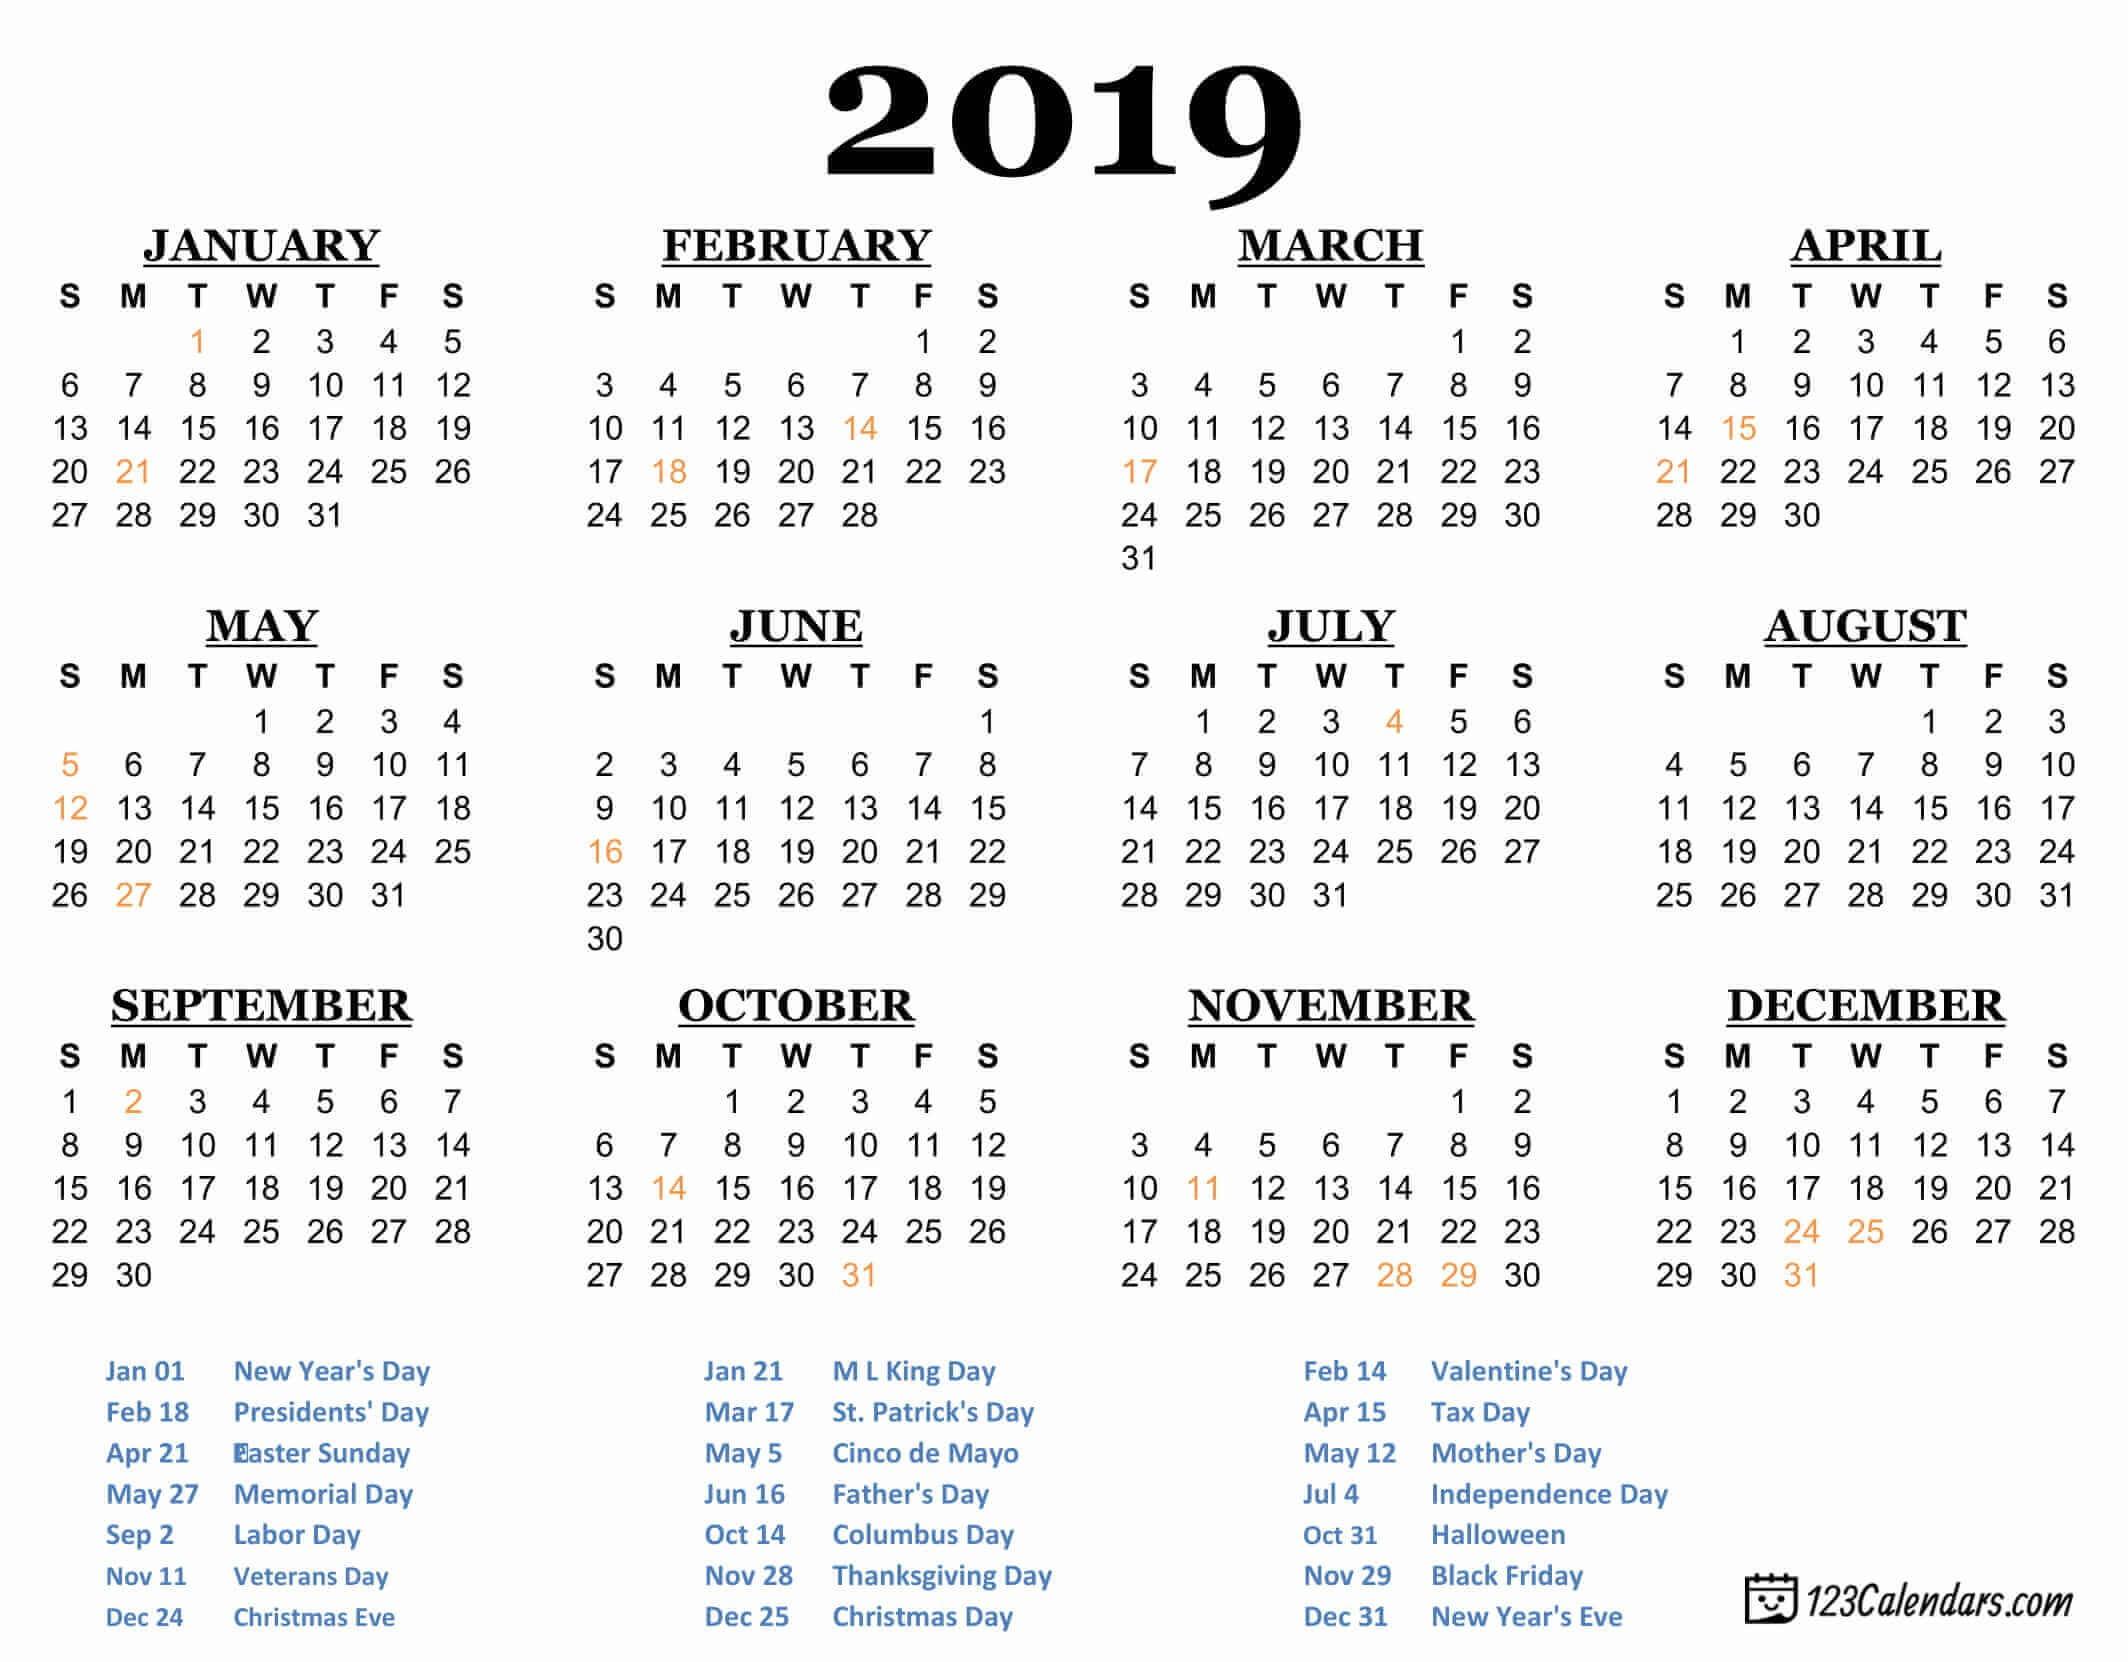 Calendars Printable 2019 2019 Printable Calendar 123calendars